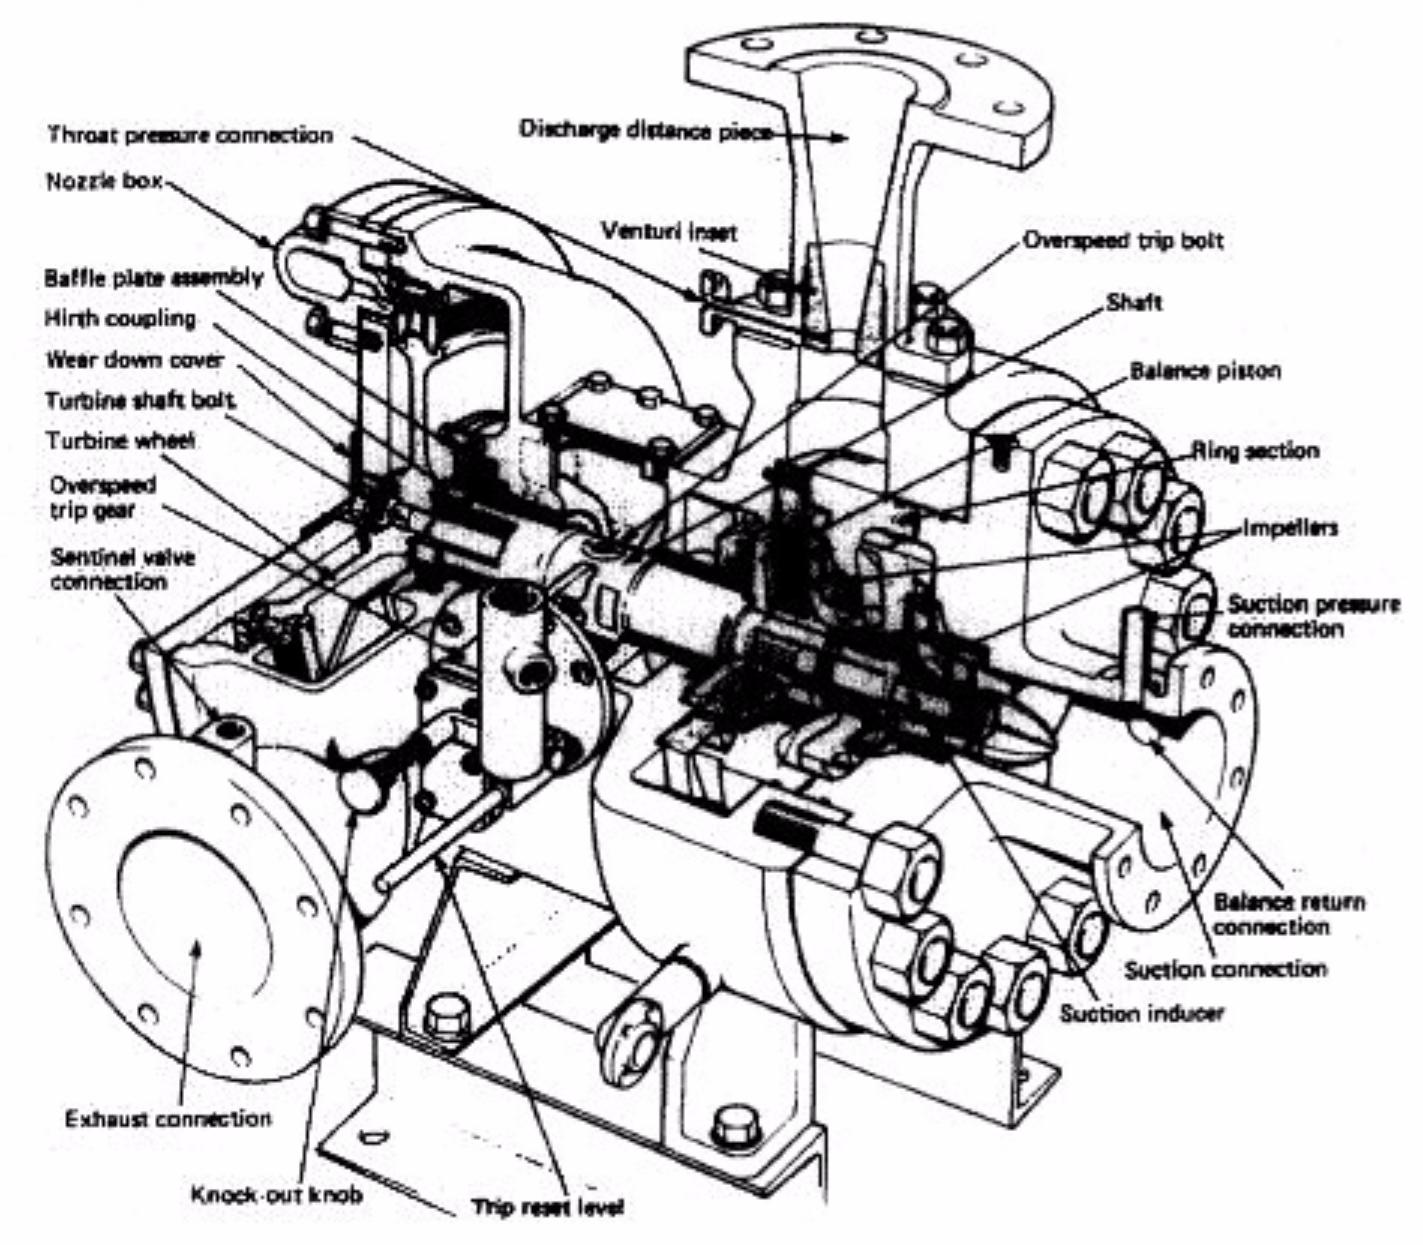 kembara insan    engineer u0026 39 s blog  boiler feed pump